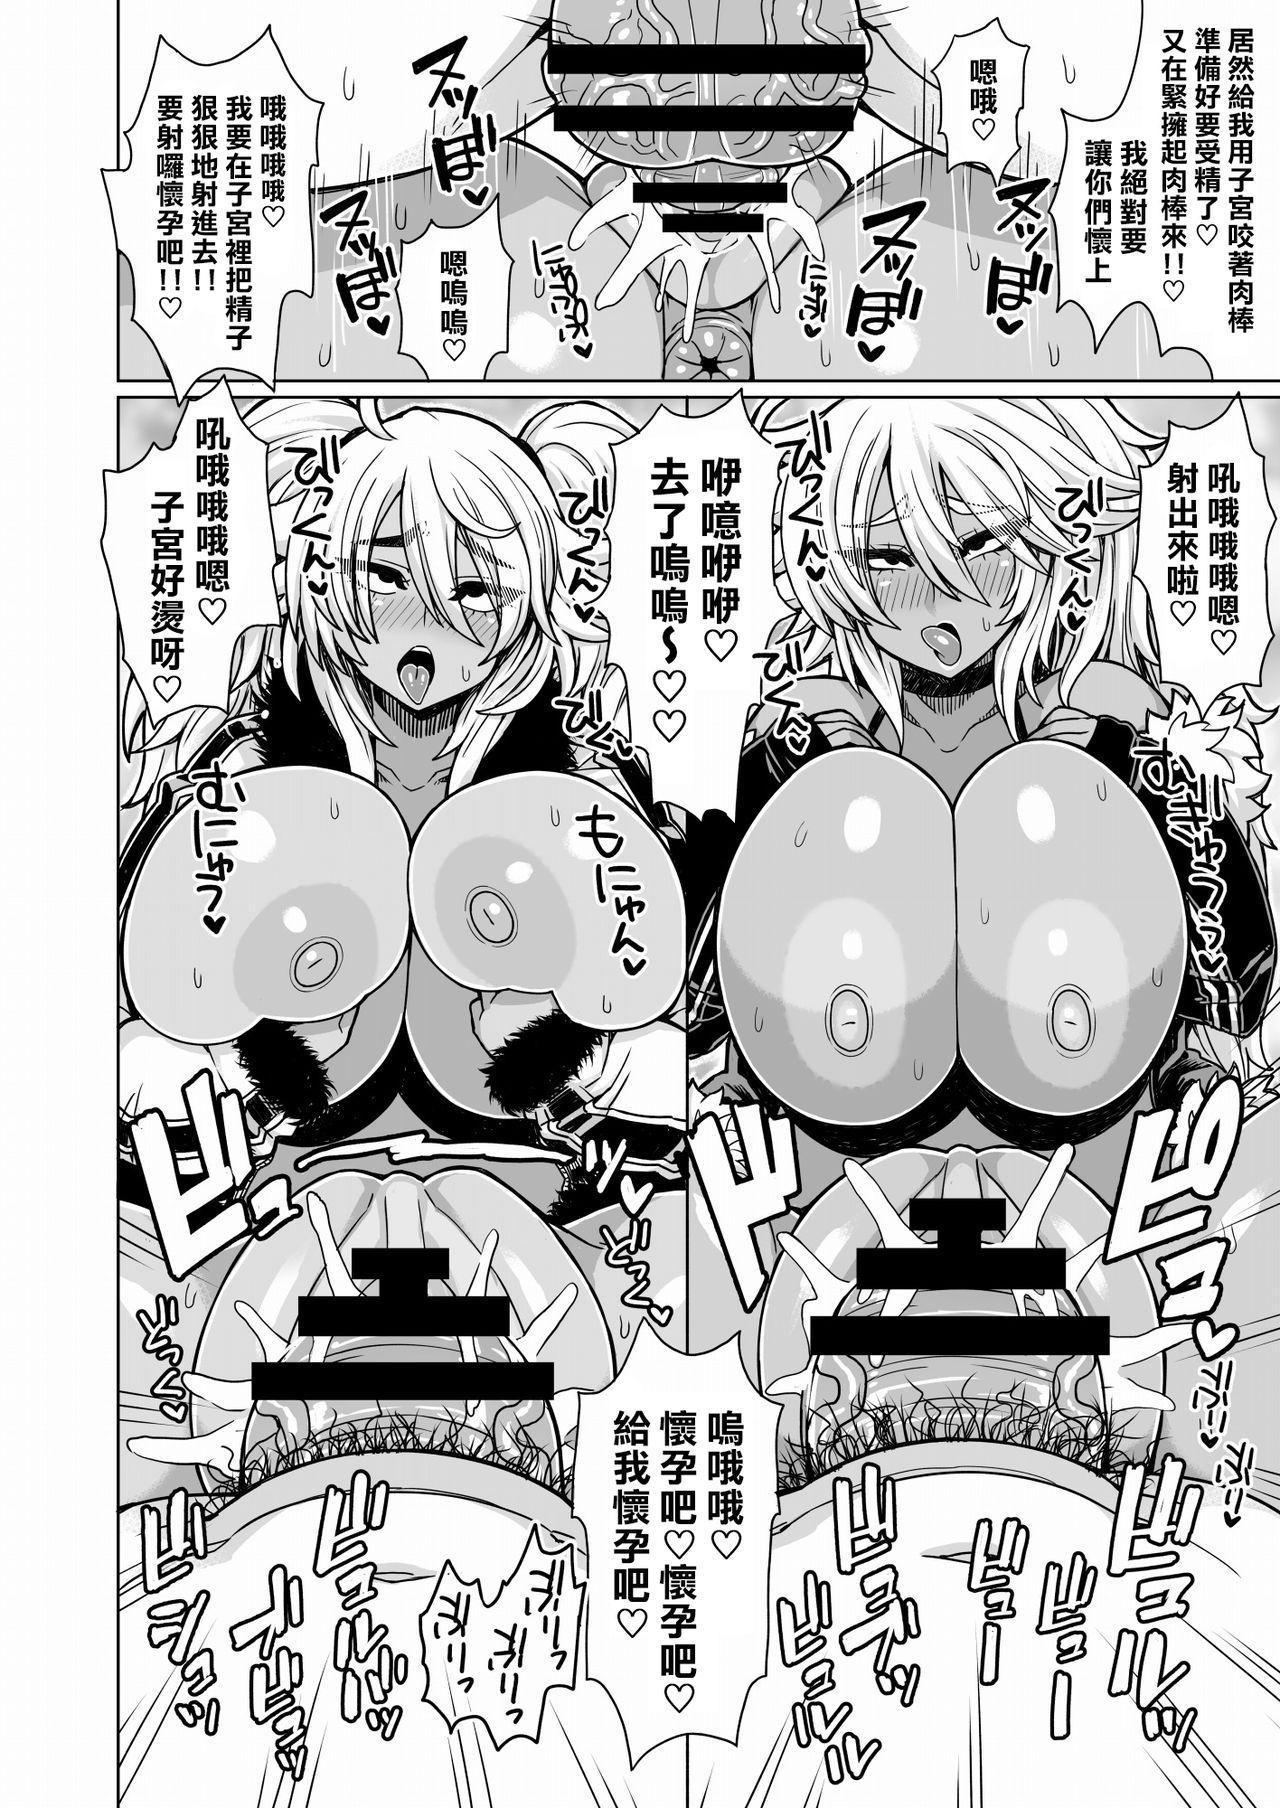 Futari no Kuro Gal Yankee | 兩個不良黑皮辣妹 22